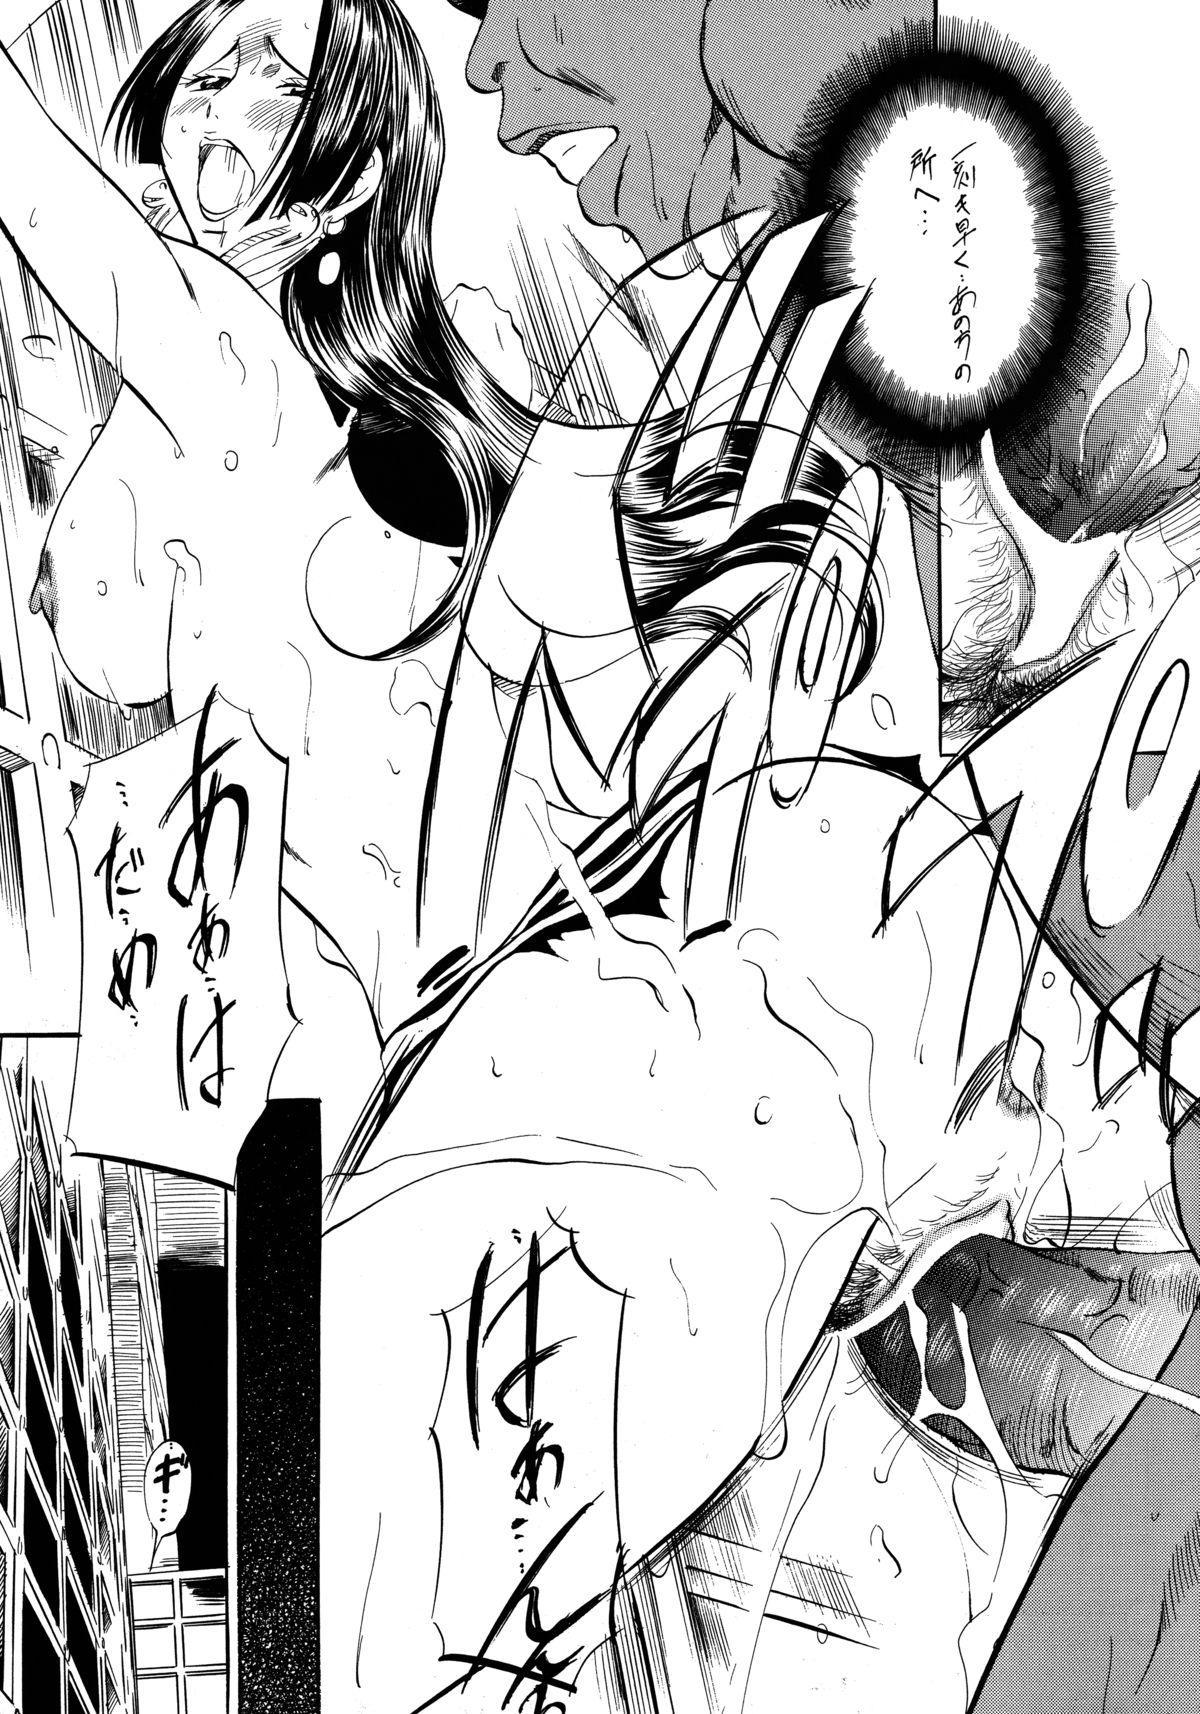 "[Busou Megami (Kannaduki Kanna)] Busou Megami Archives Series 1 ""Piece of Girl's ~Hancock Hen~"" (One Piece) 28"